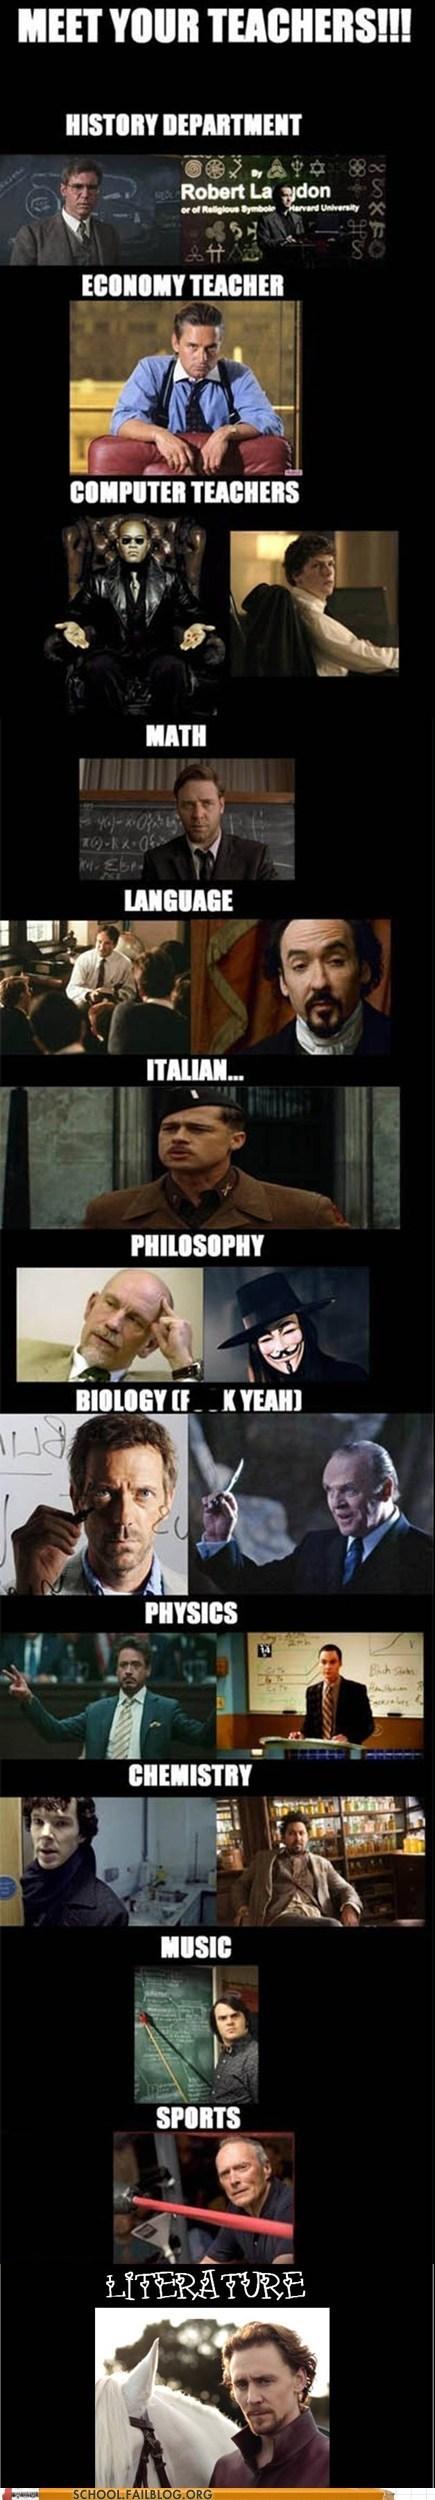 best faculty ever fictional teachers teachers - 6559785216